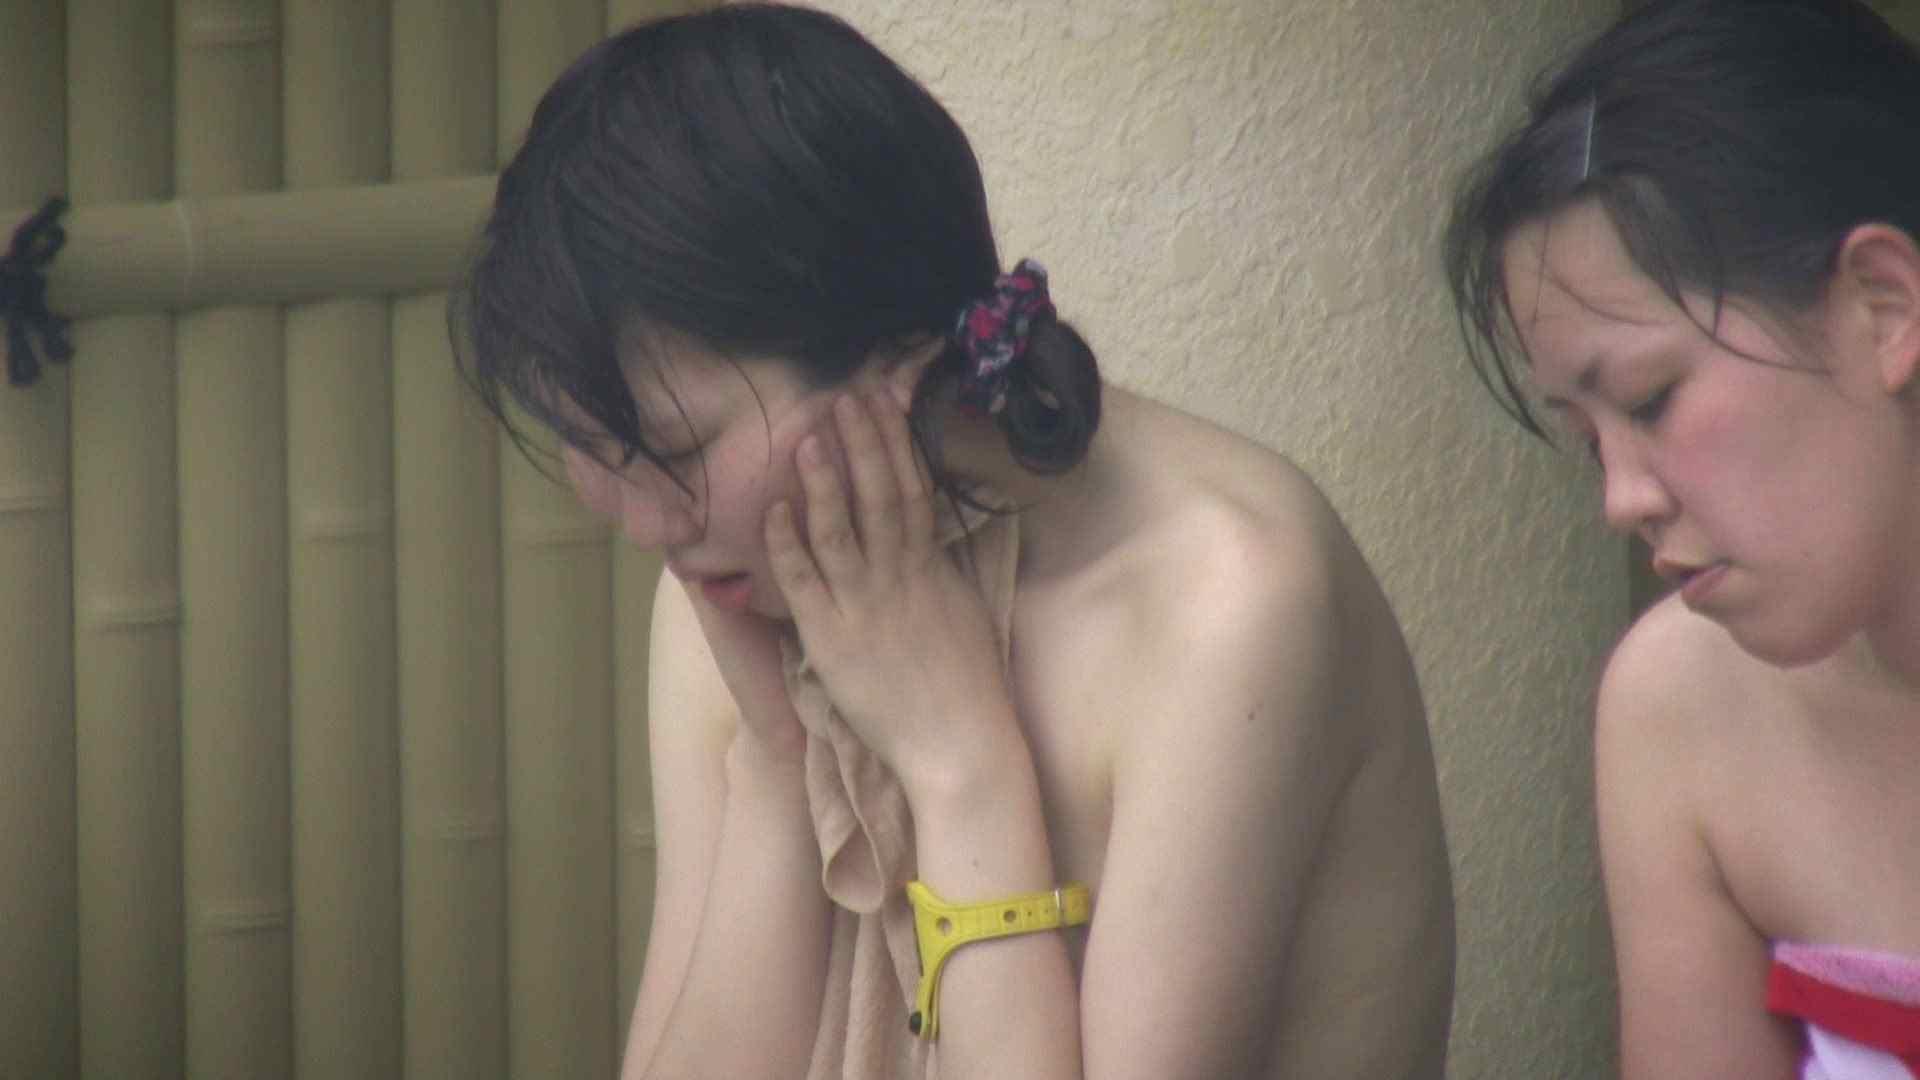 Aquaな露天風呂Vol.128 露天風呂編 | 盗撮シリーズ  92PIX 85